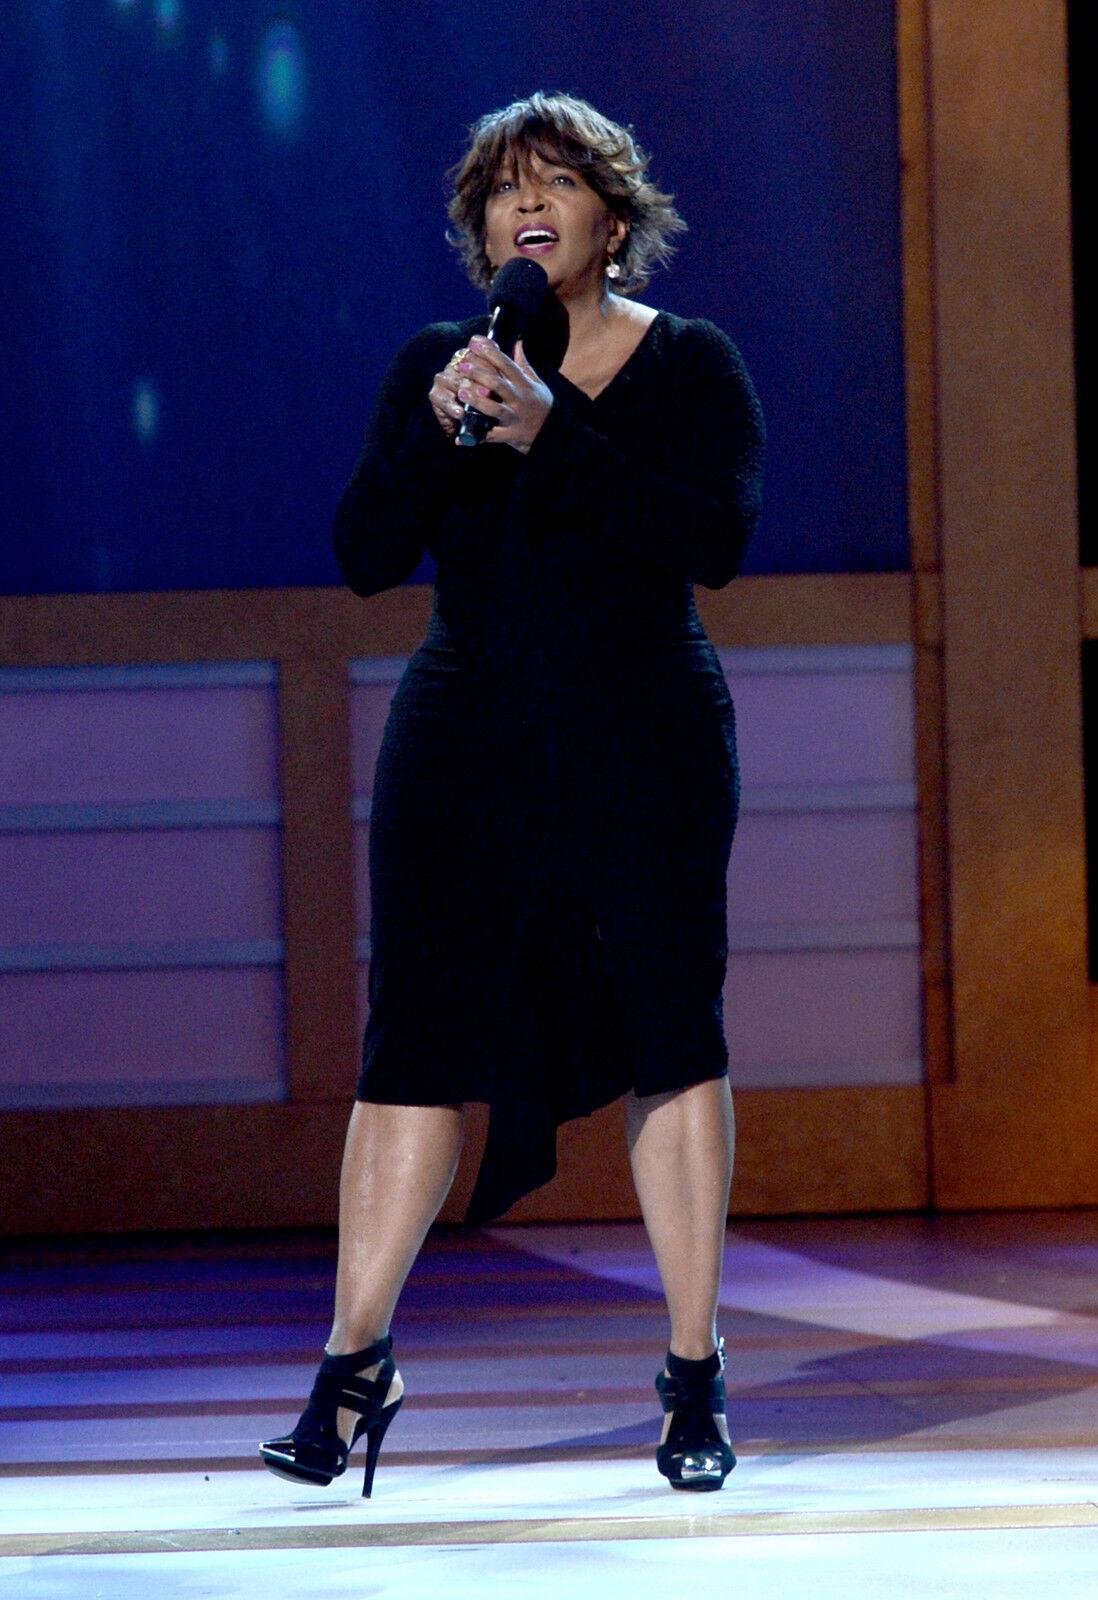 Anita Baker Concert Tour